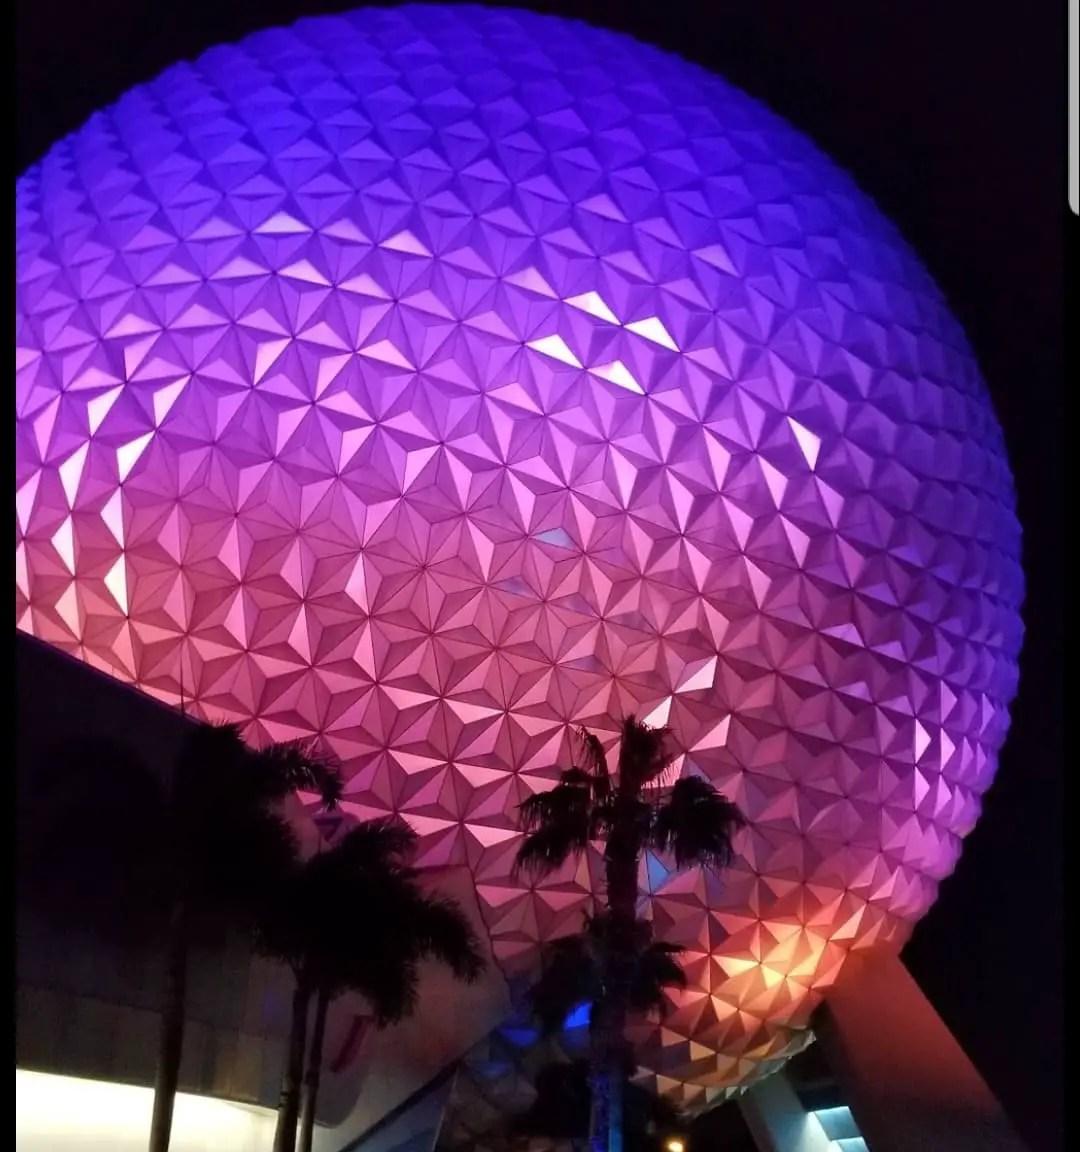 Industrial Accident at Walt Disney World